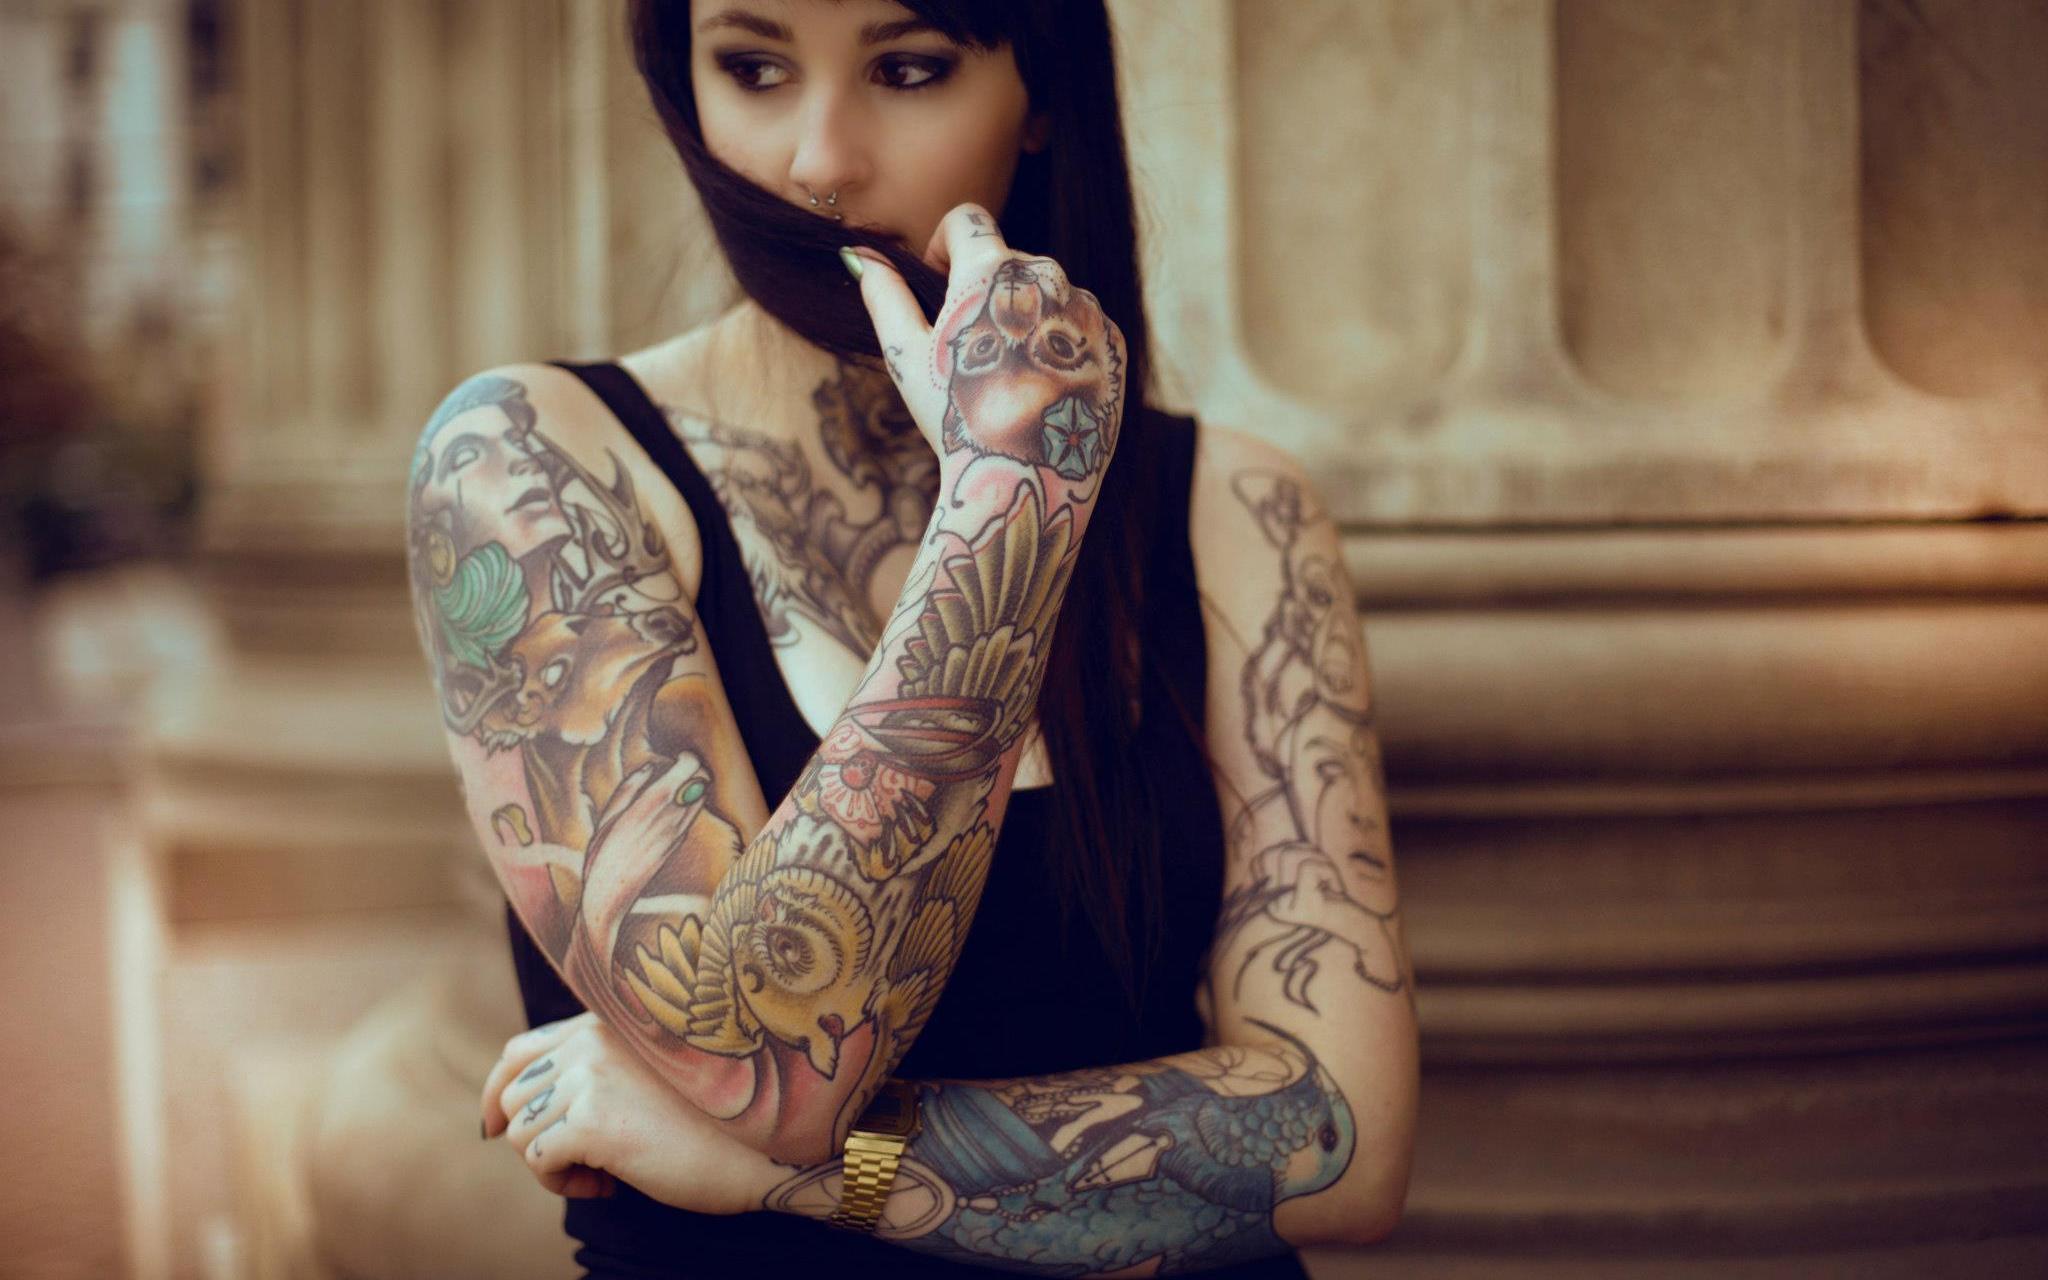 Sxy tattoo girls 9